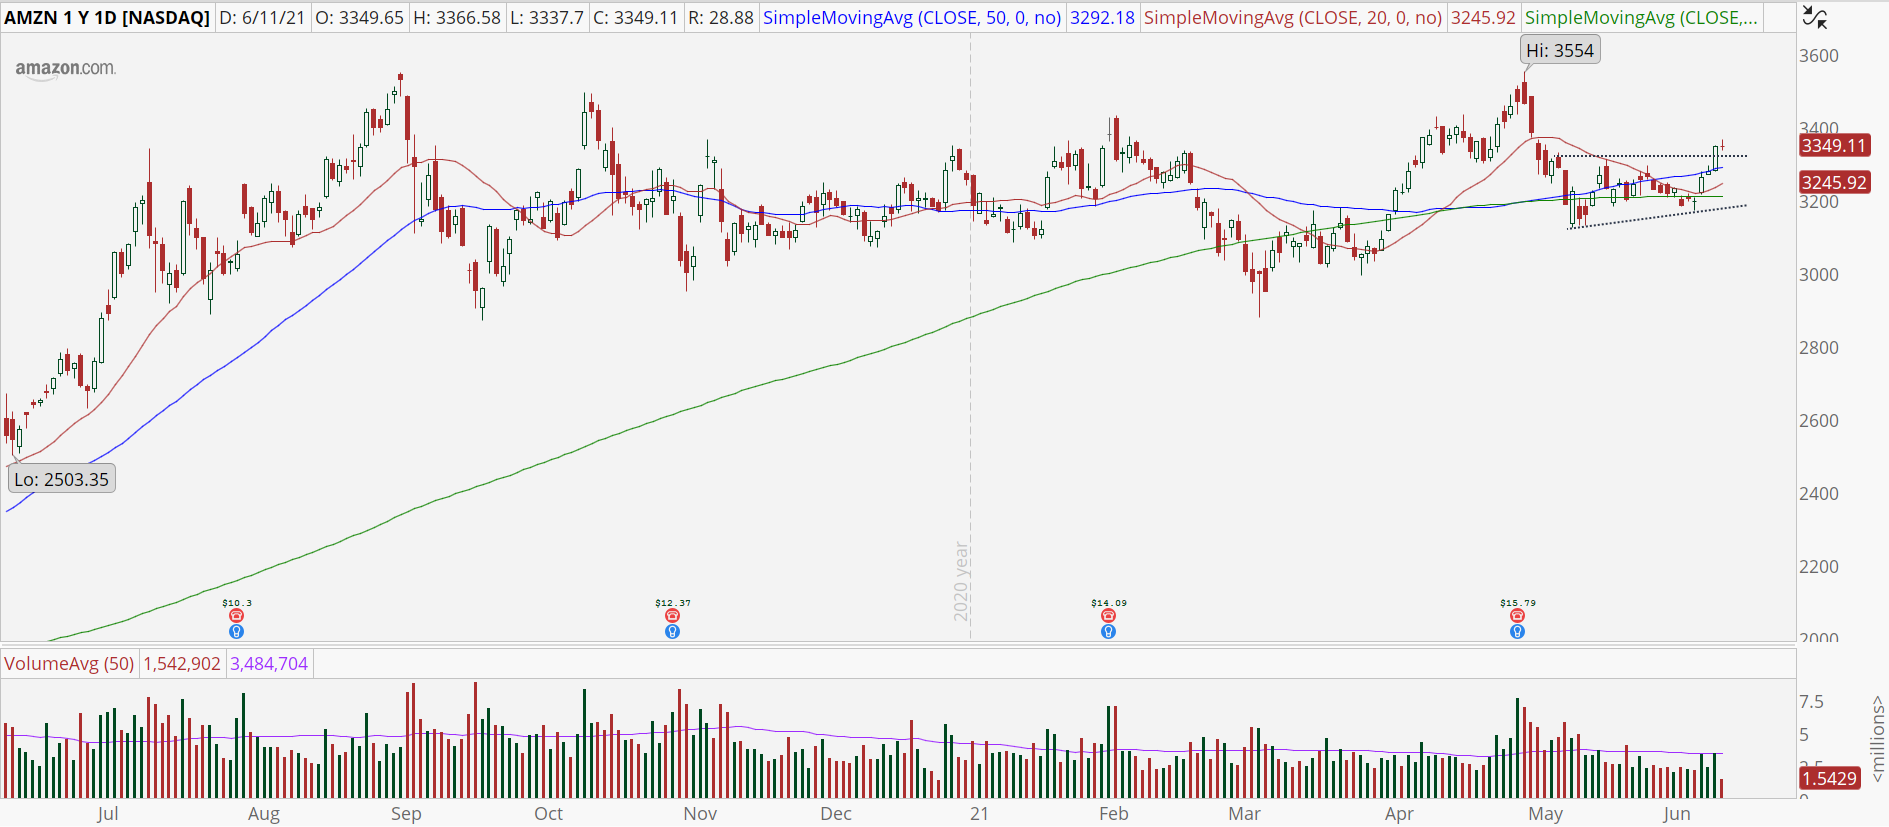 Amazon (AMZN) stock chart with bullish breakout